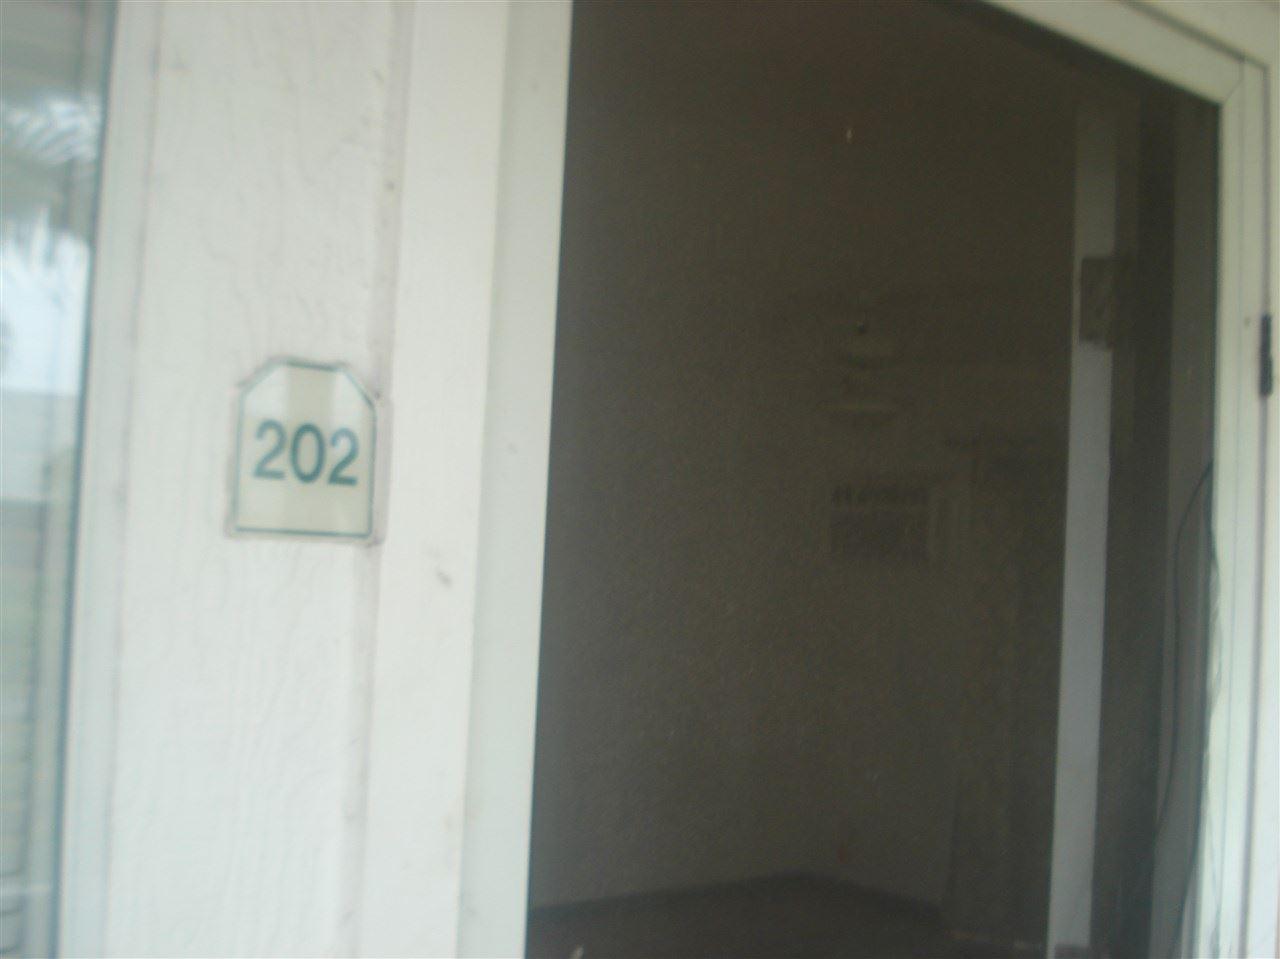 Photo of 1030 Eha St #202, Wailuku, HI 96793 (MLS # 391251)